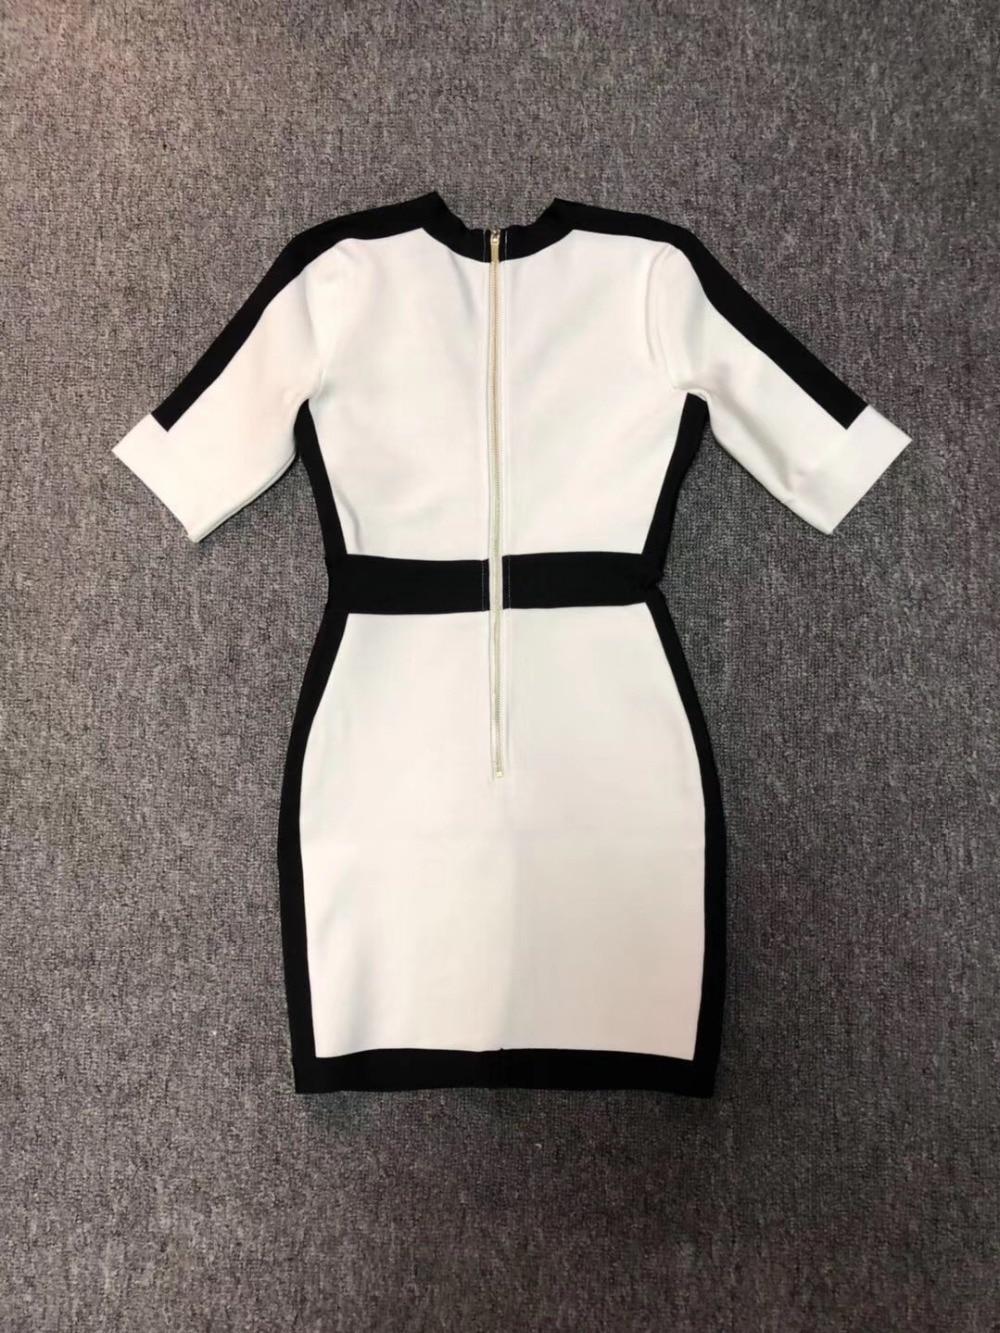 Women Sexy V Neck Half Sleeve Bandage Dress 19 Ladies Elegant Designer Bodycon Bandage Dress 3